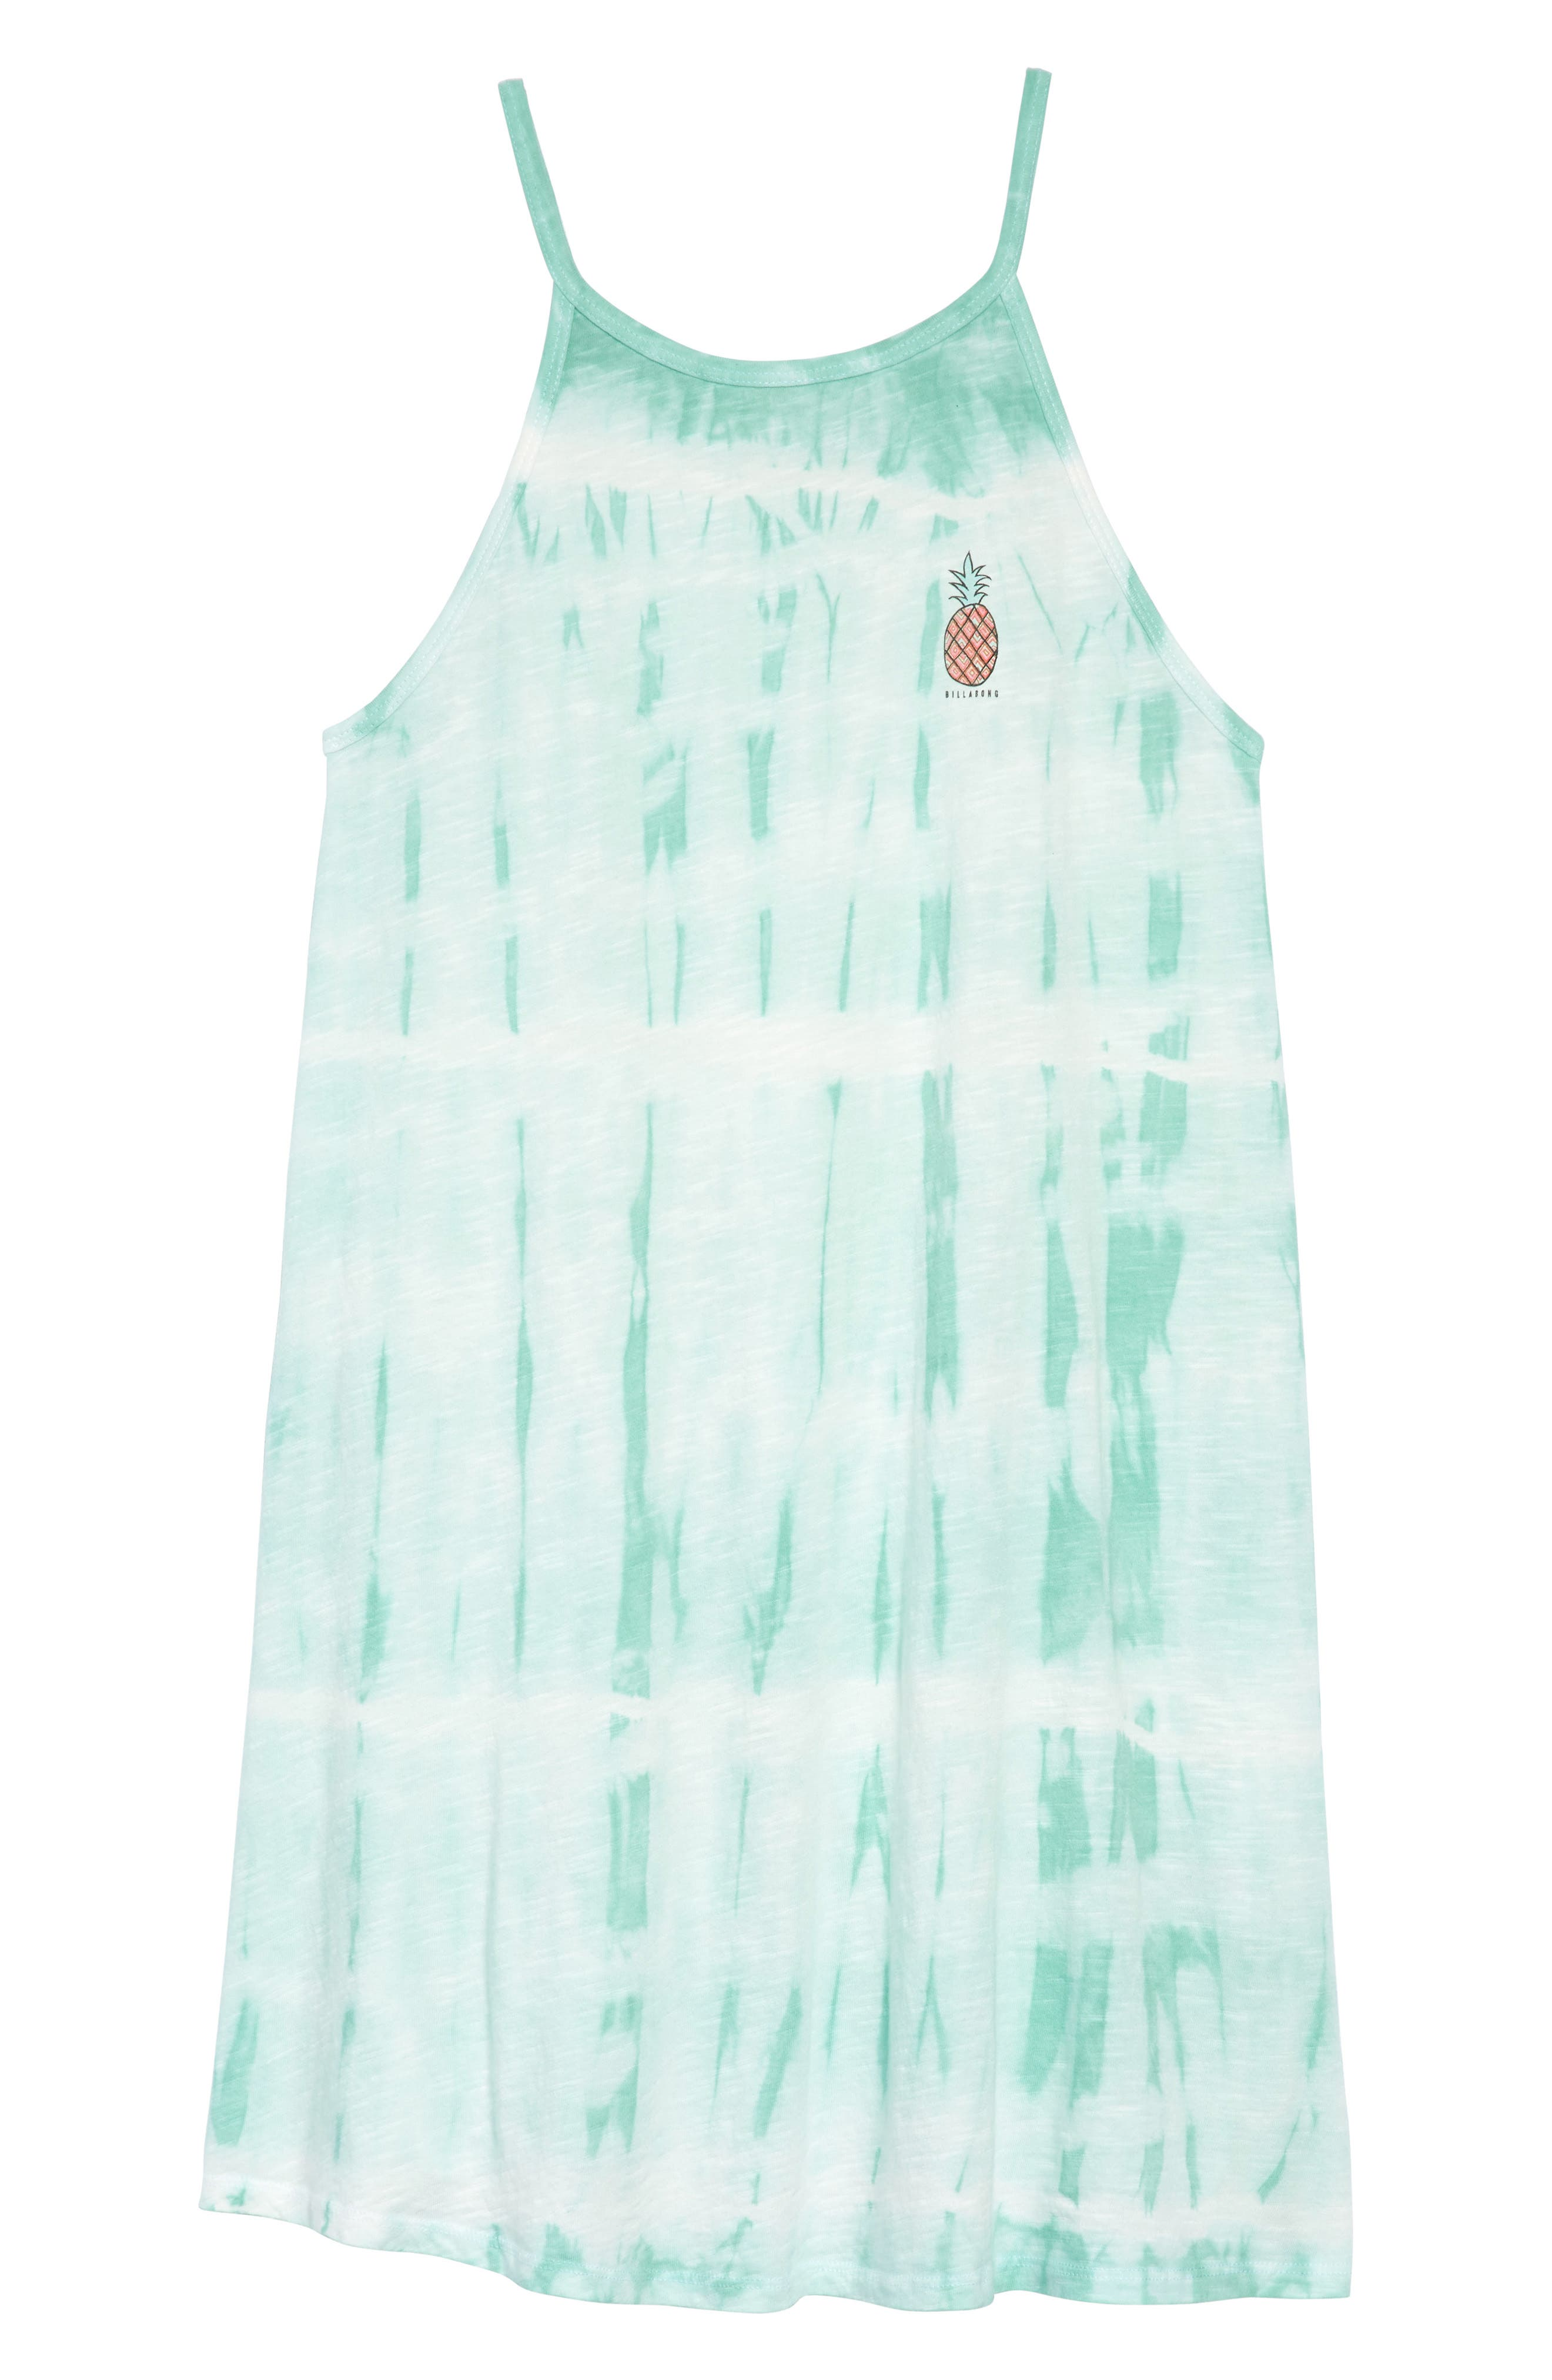 Namaste All Day Tie-Dye Dress,                             Main thumbnail 1, color,                             Beach Glass